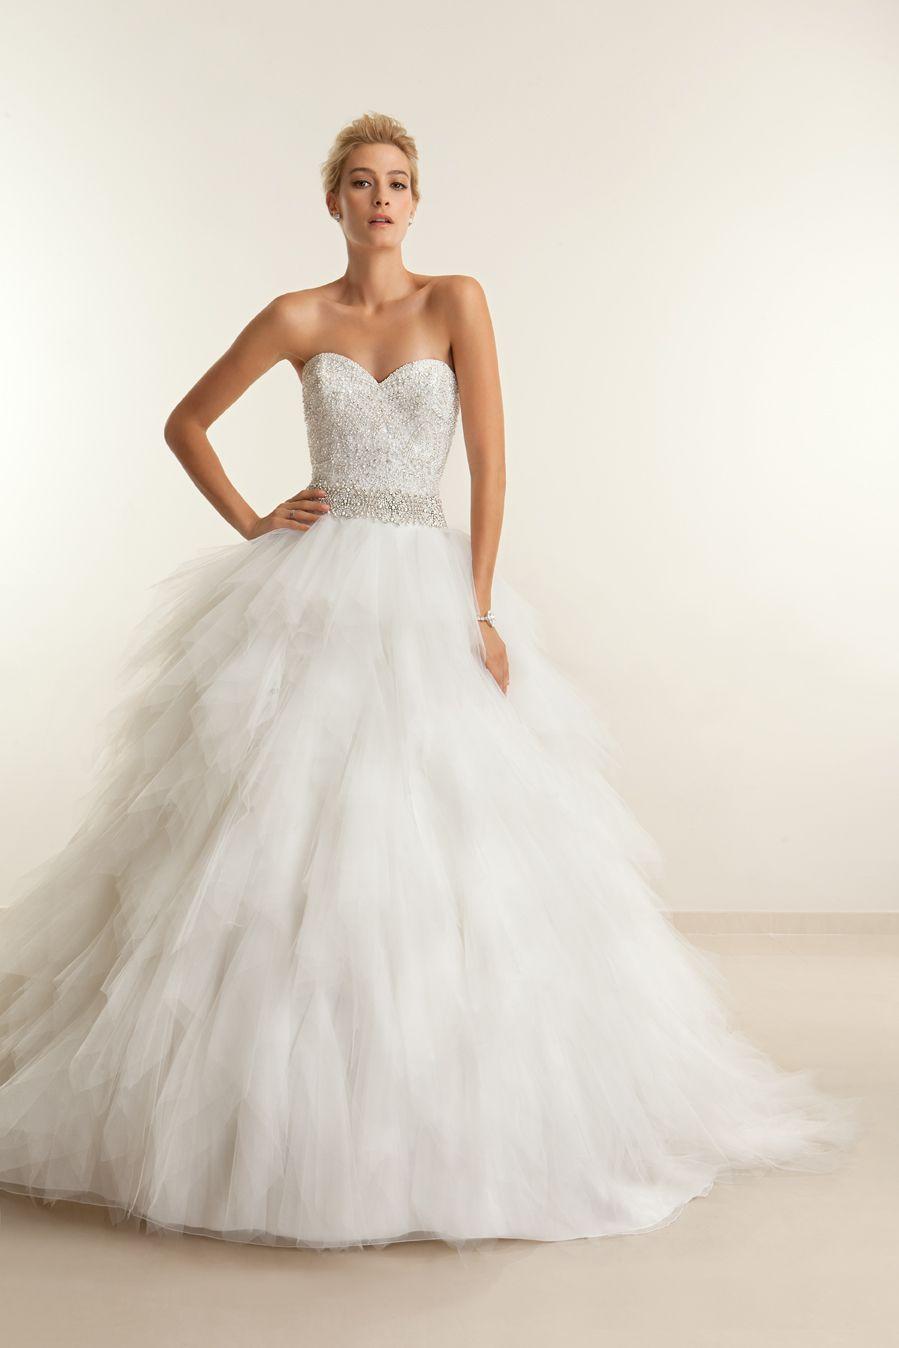 Demetrios platinum dp315 wedding dress expert wedding demetrios platinum dp315 wedding dress expert ombrellifo Images